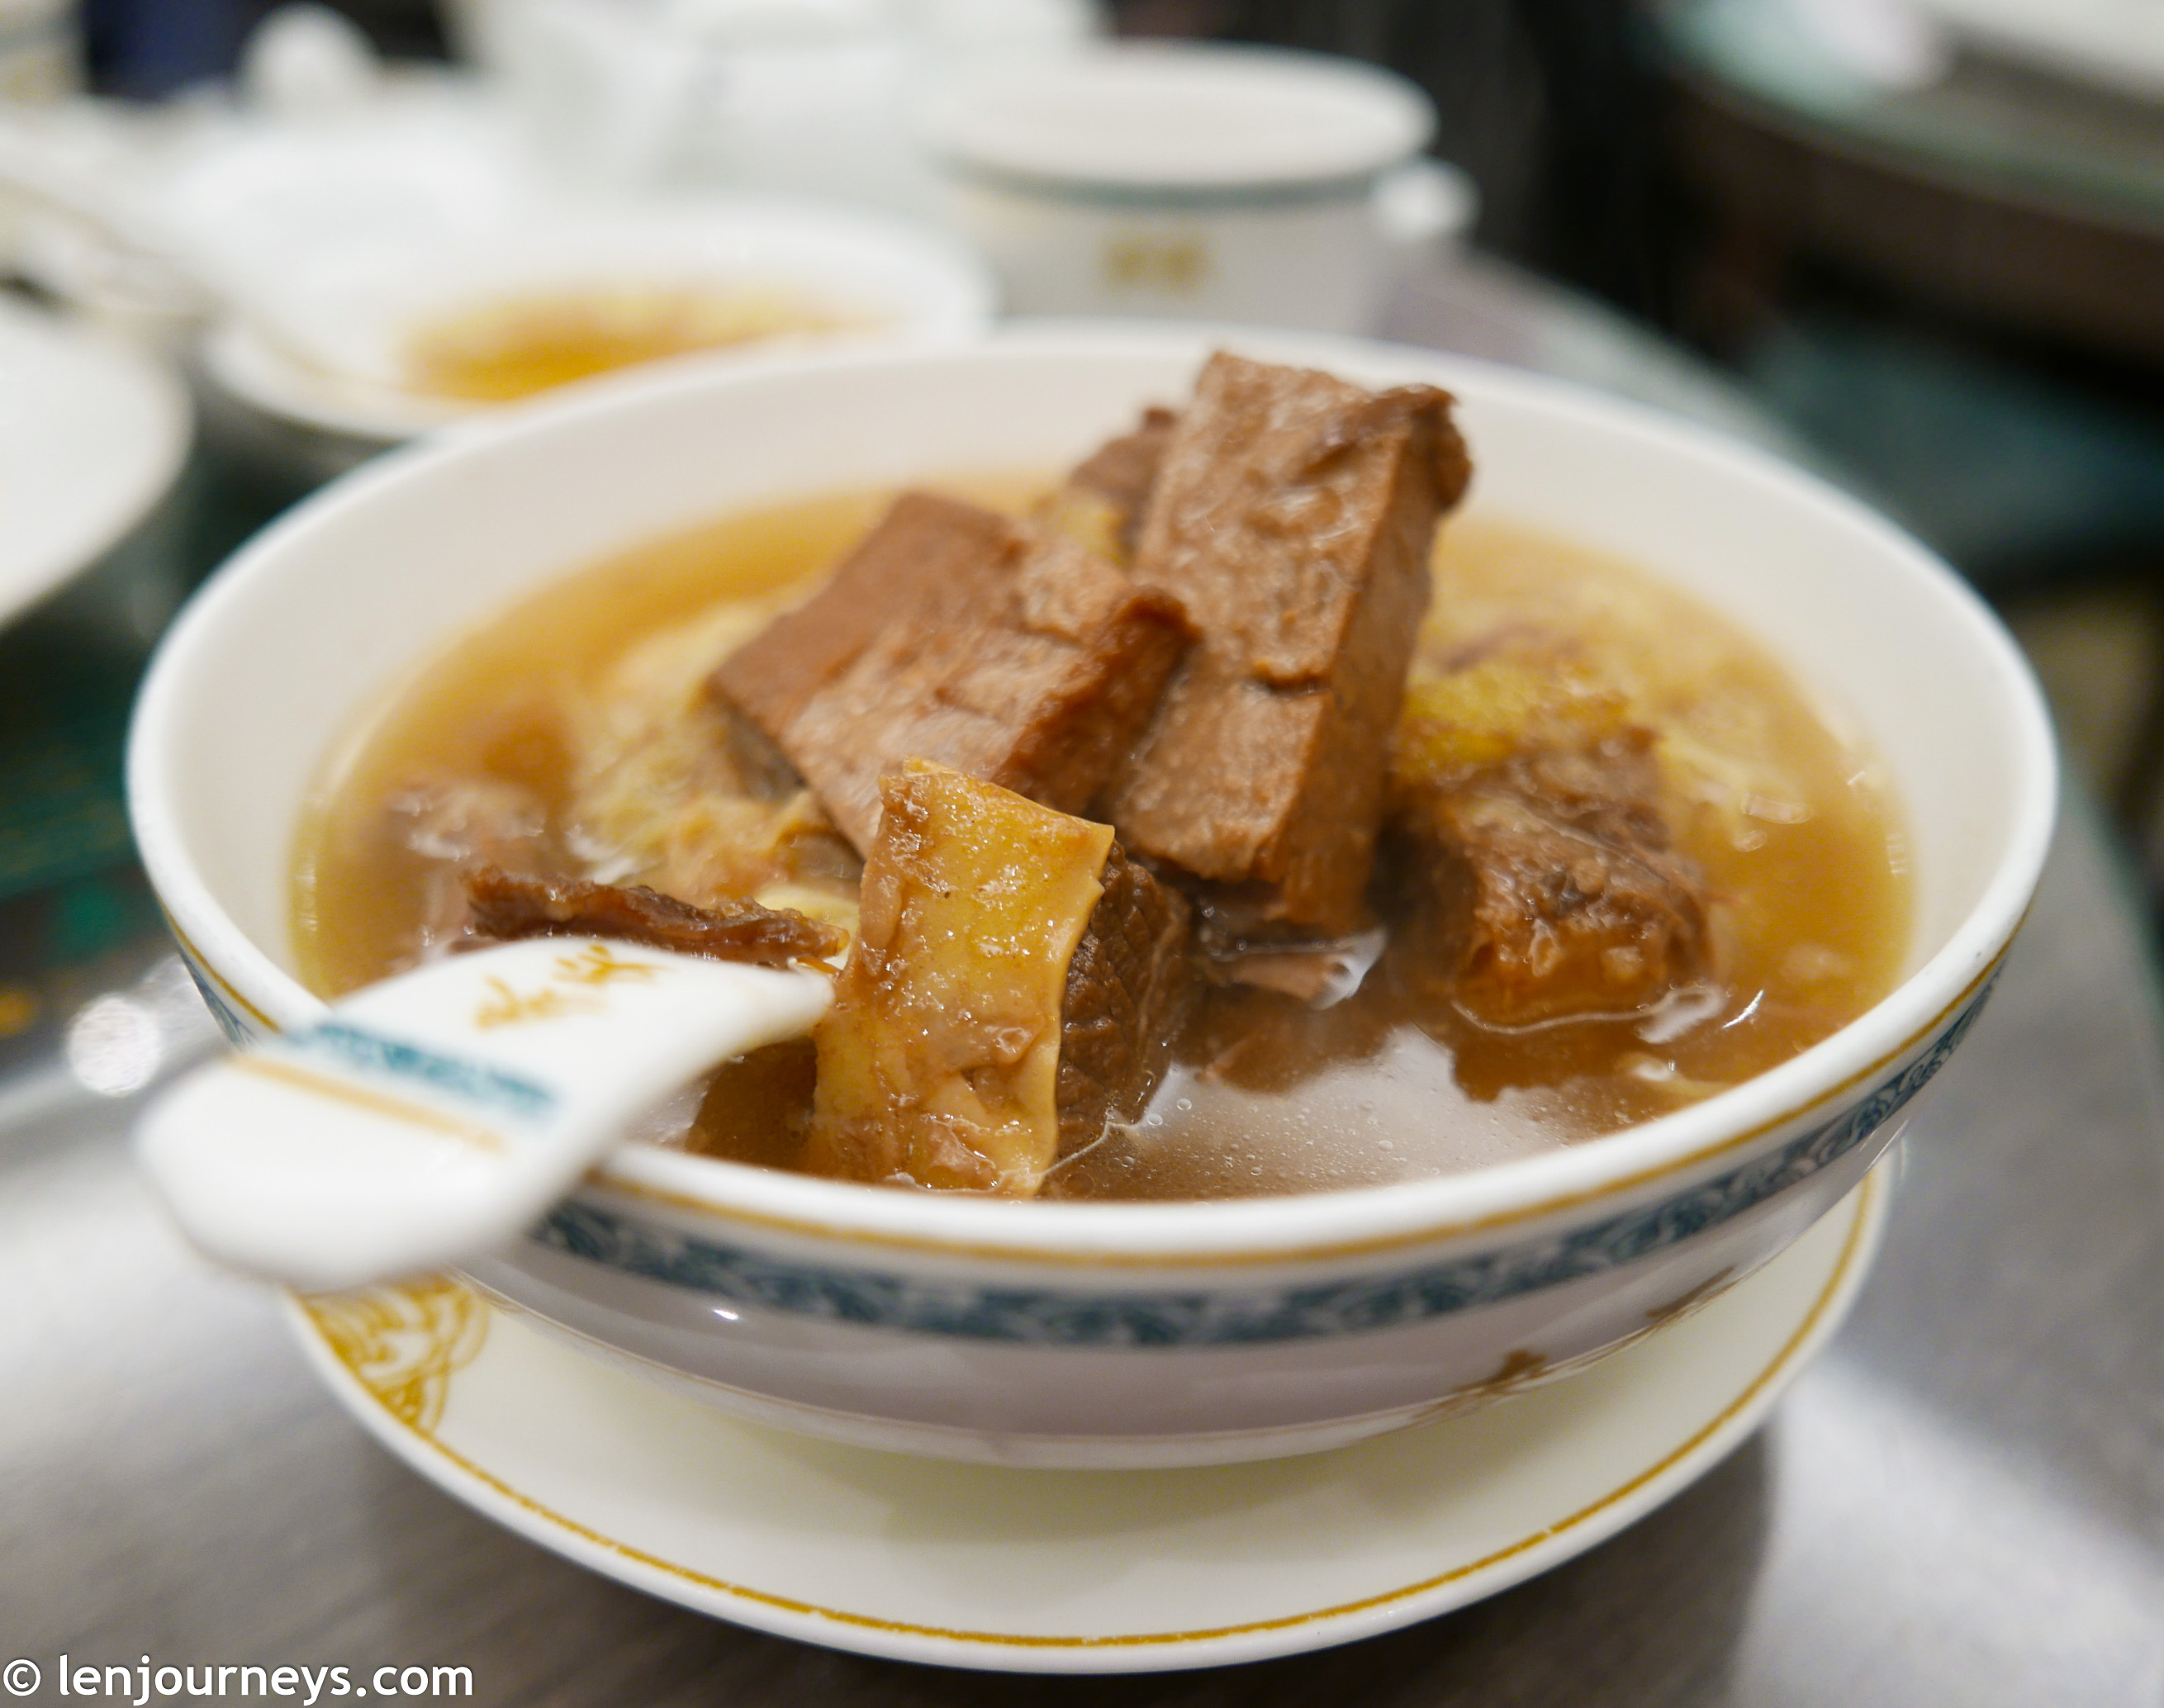 Hong Kong beef noodle